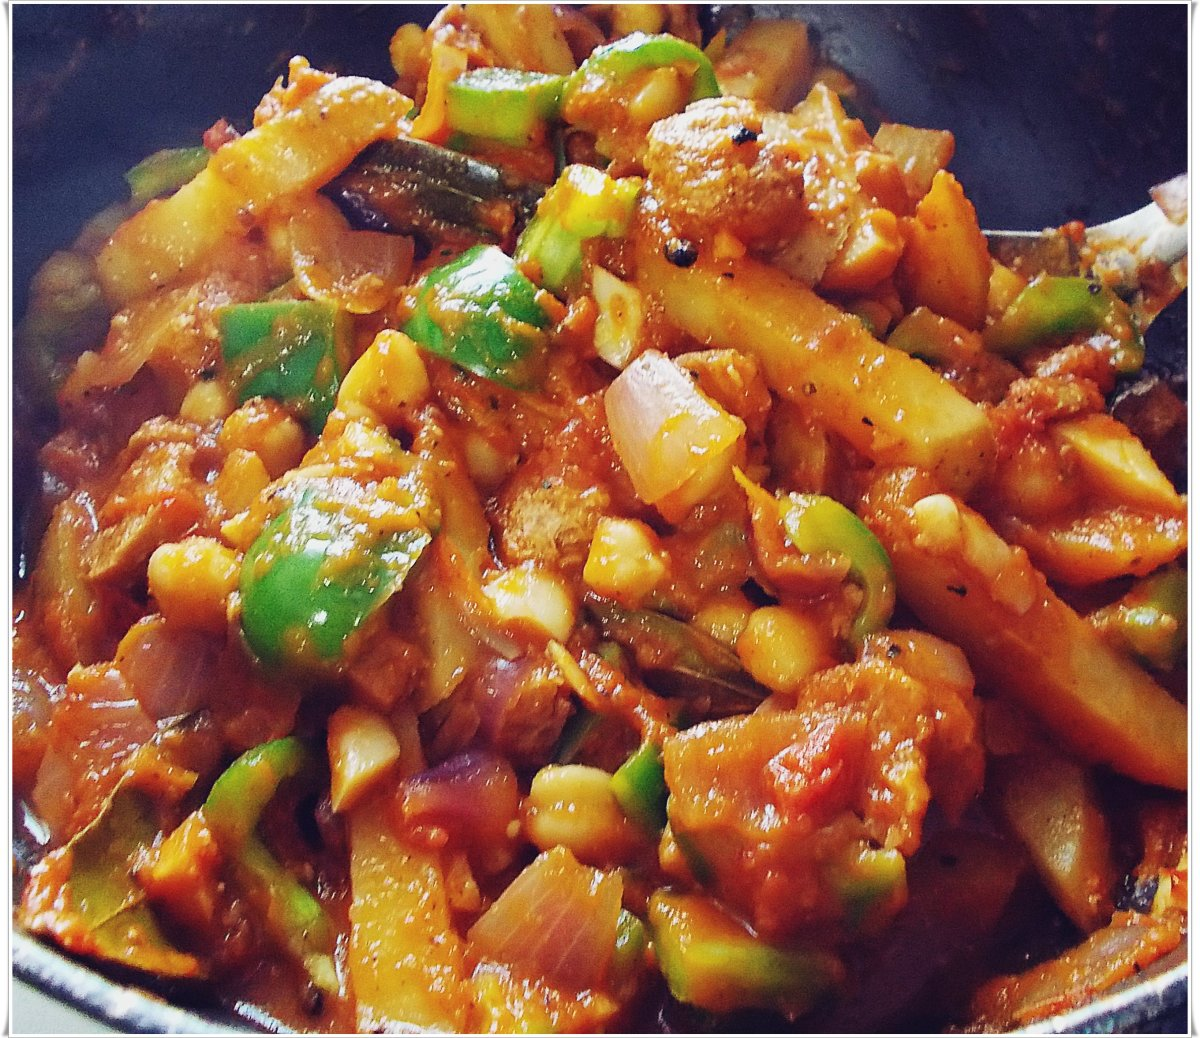 Vegan Afritada: A Tomato-Based Recipe